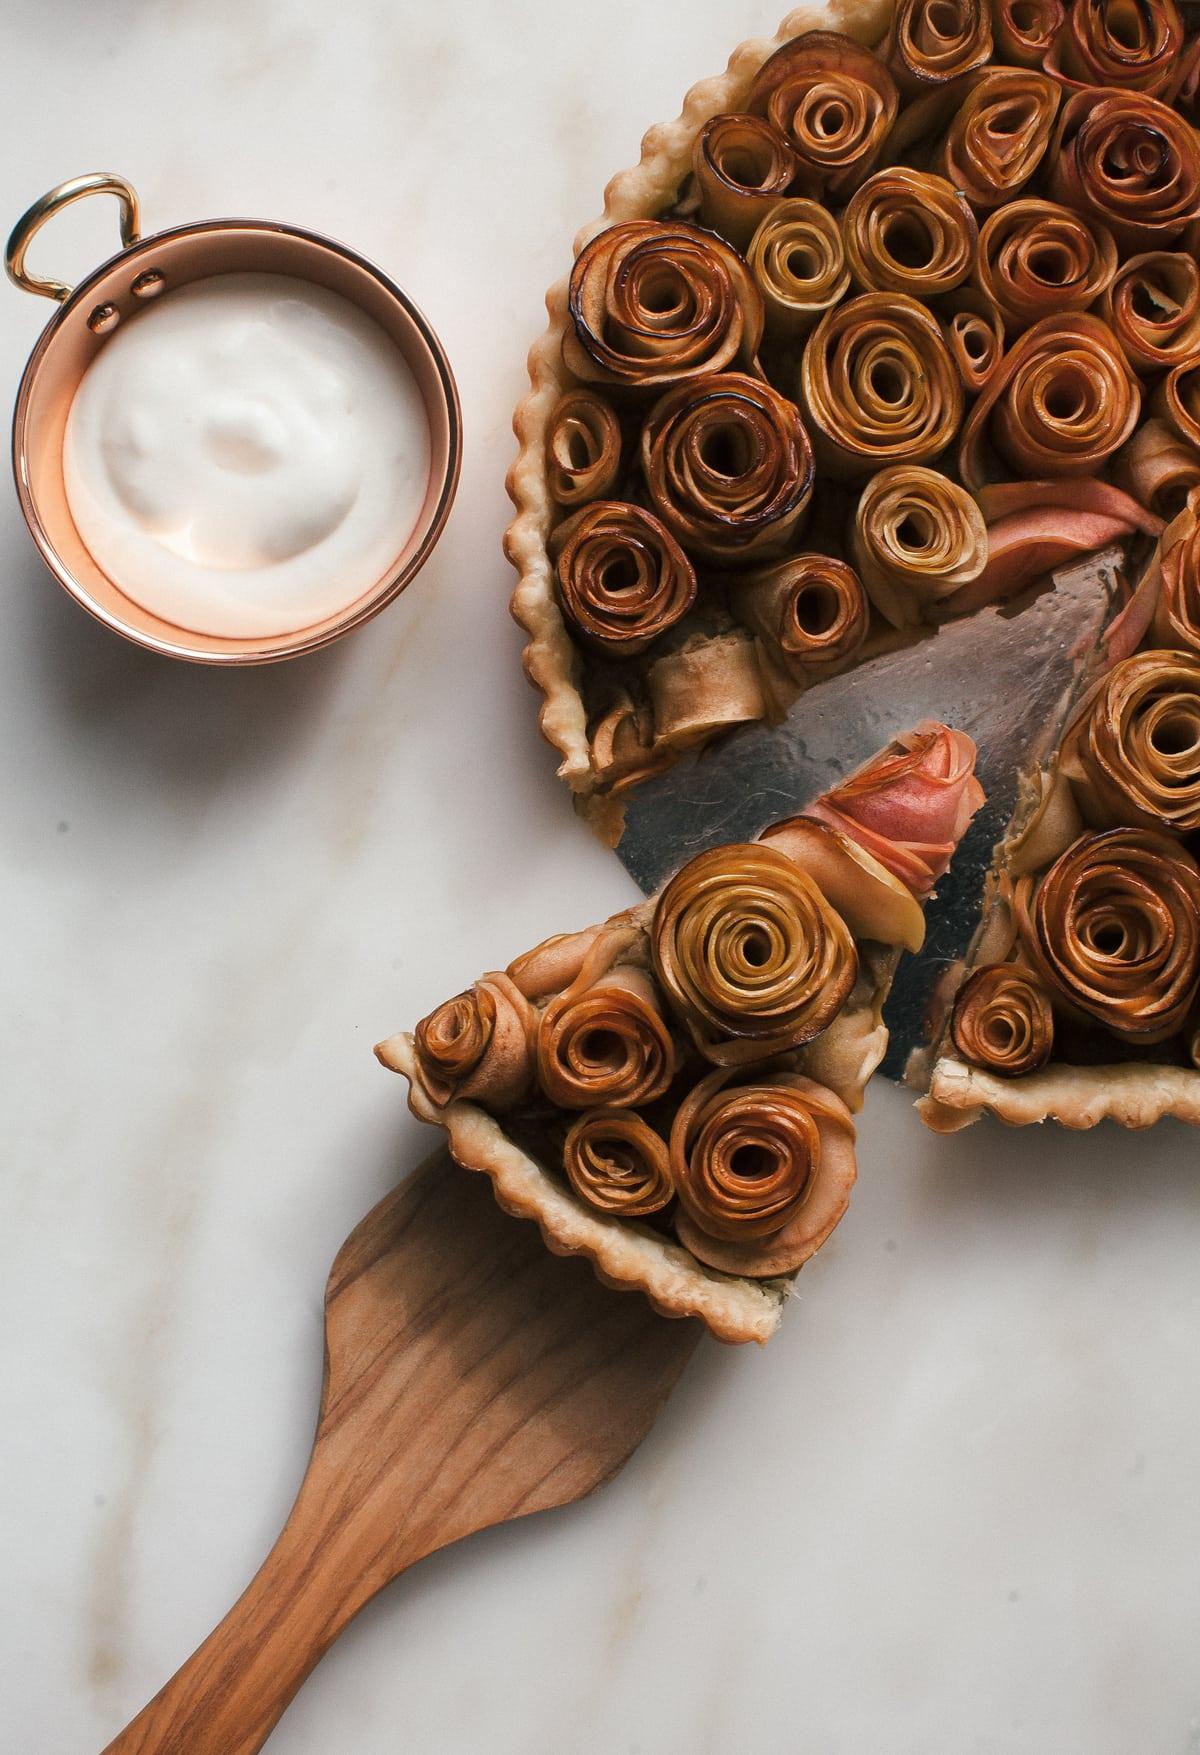 how to make rose apple tarts